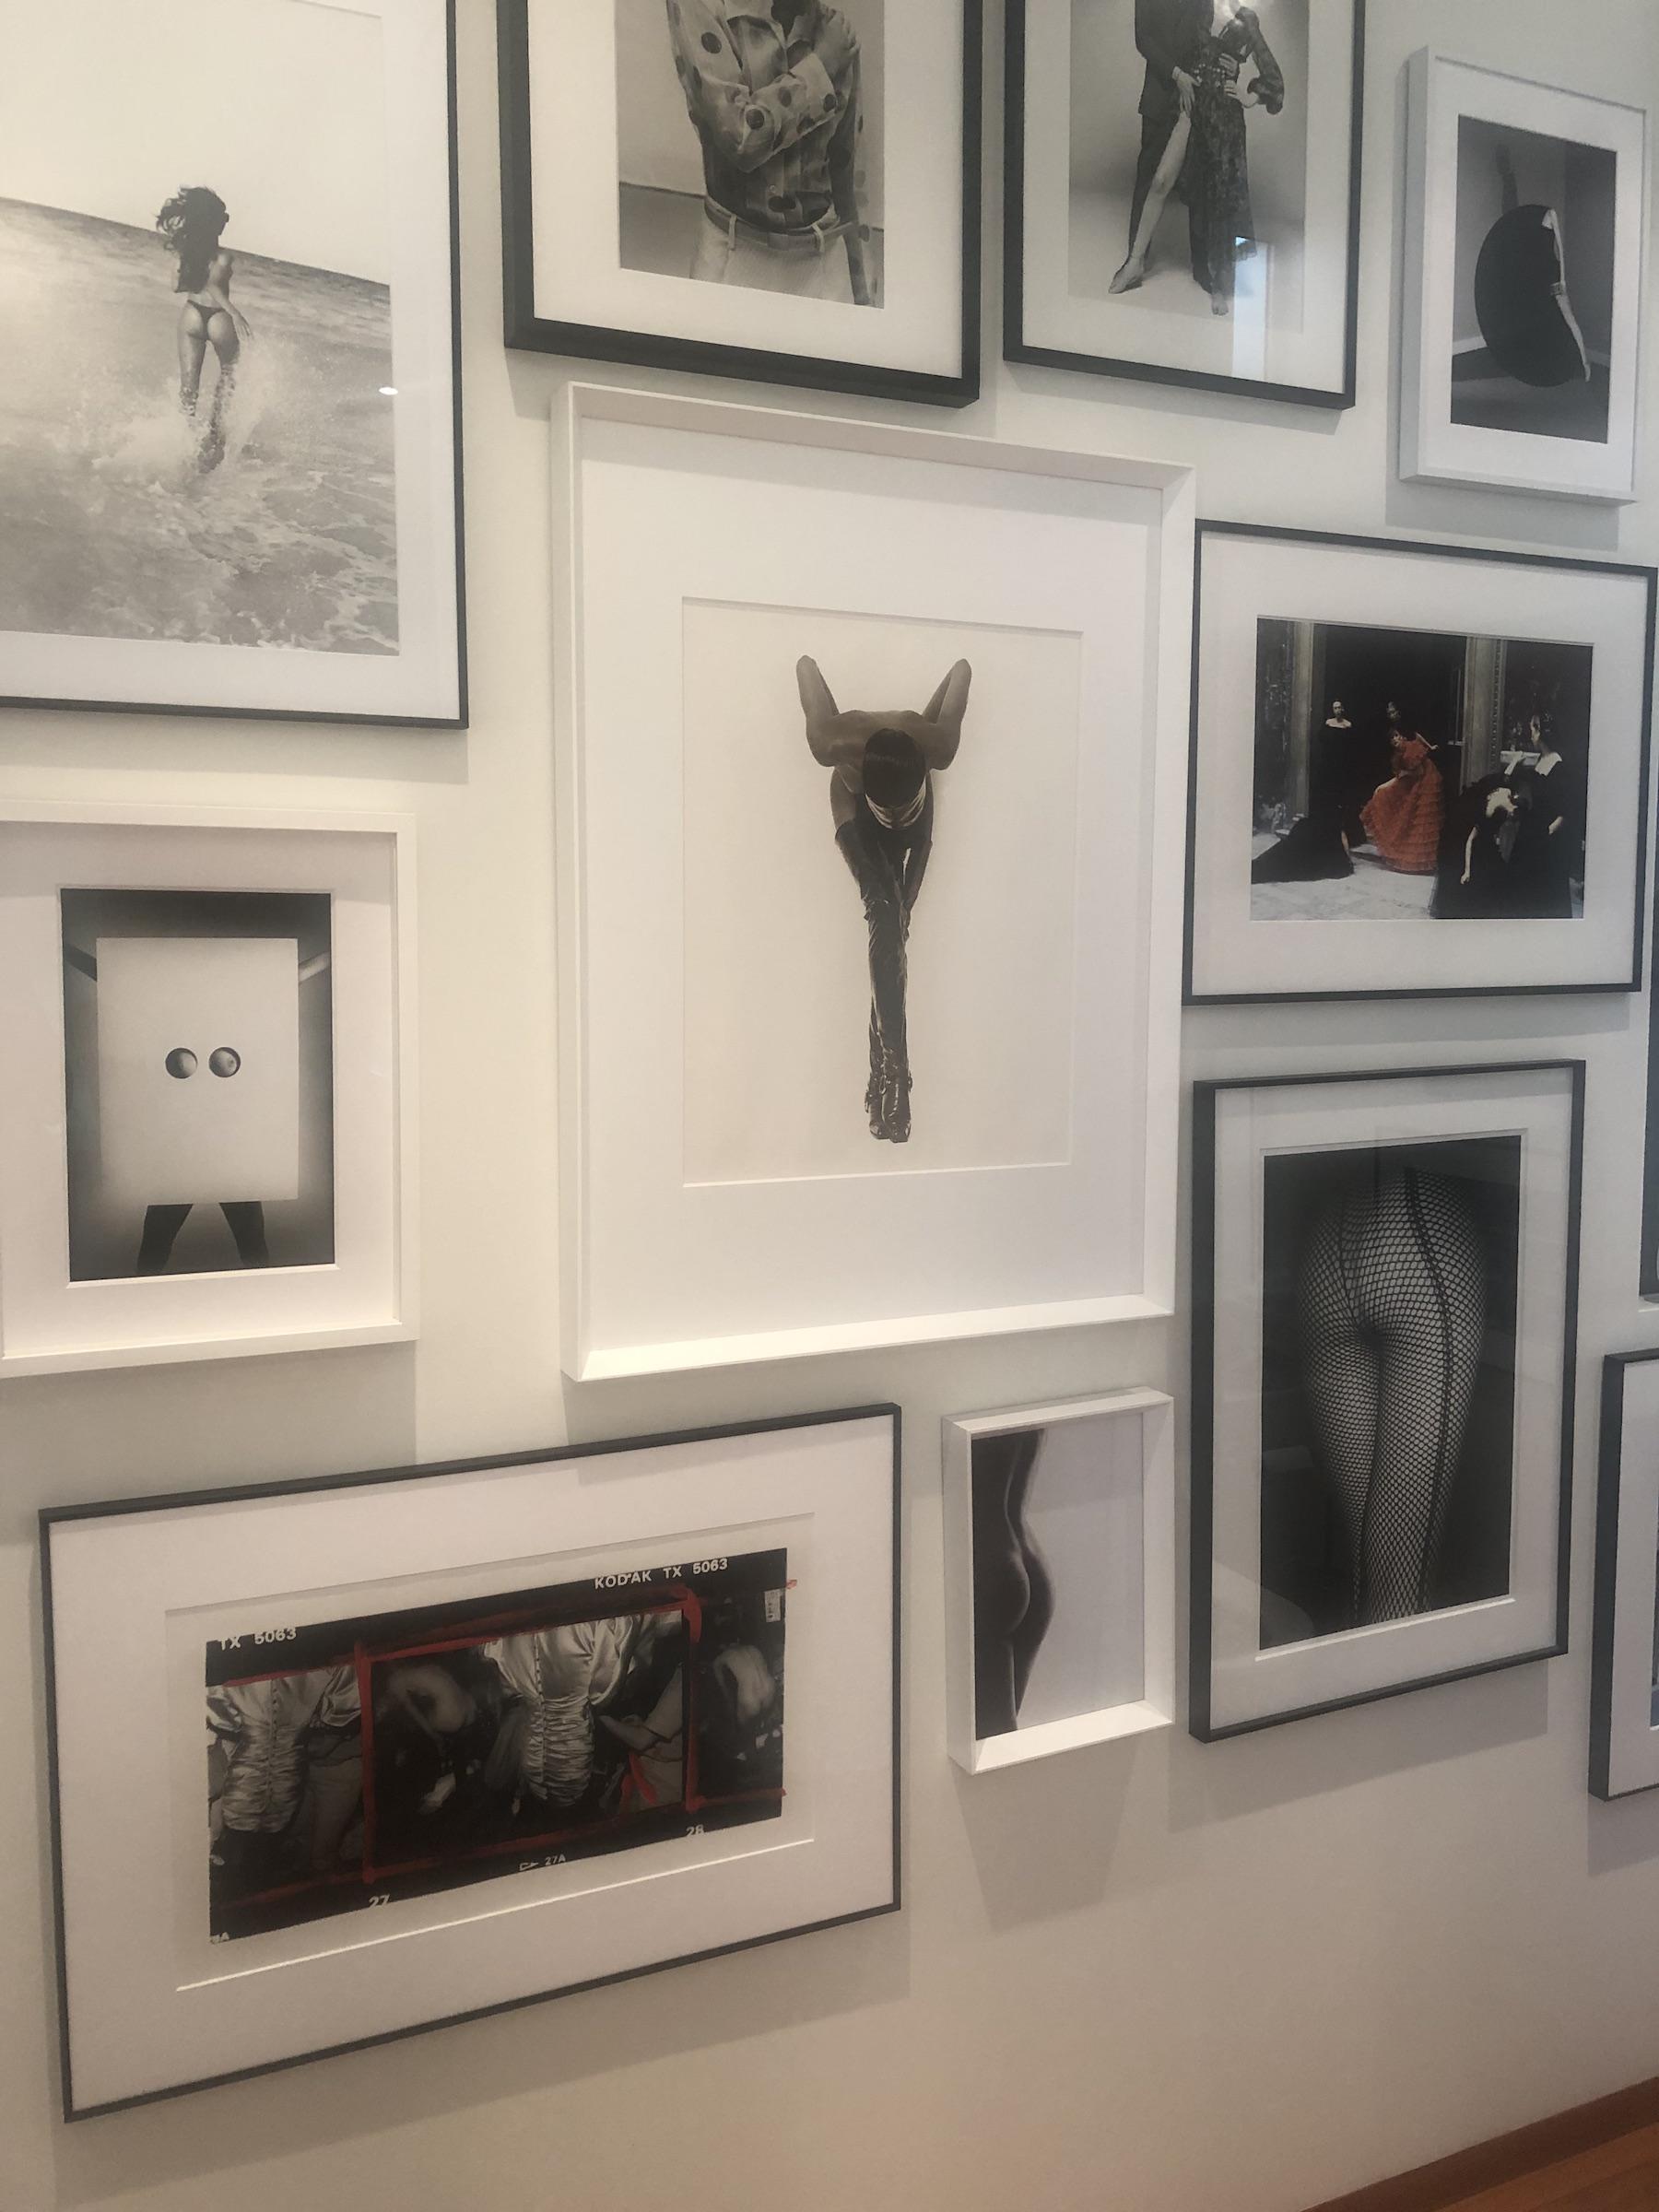 Wall with all the fashion photographs: Pamela Hanson, Michel Comte, Terry, O'Neill, Noè Sendas, Carlo Orsi, Herb Ritts, Deborah Turbeville, William Klein, Daido Moriyama, Mario Testino. Courtesy of Bruno Bolfo.